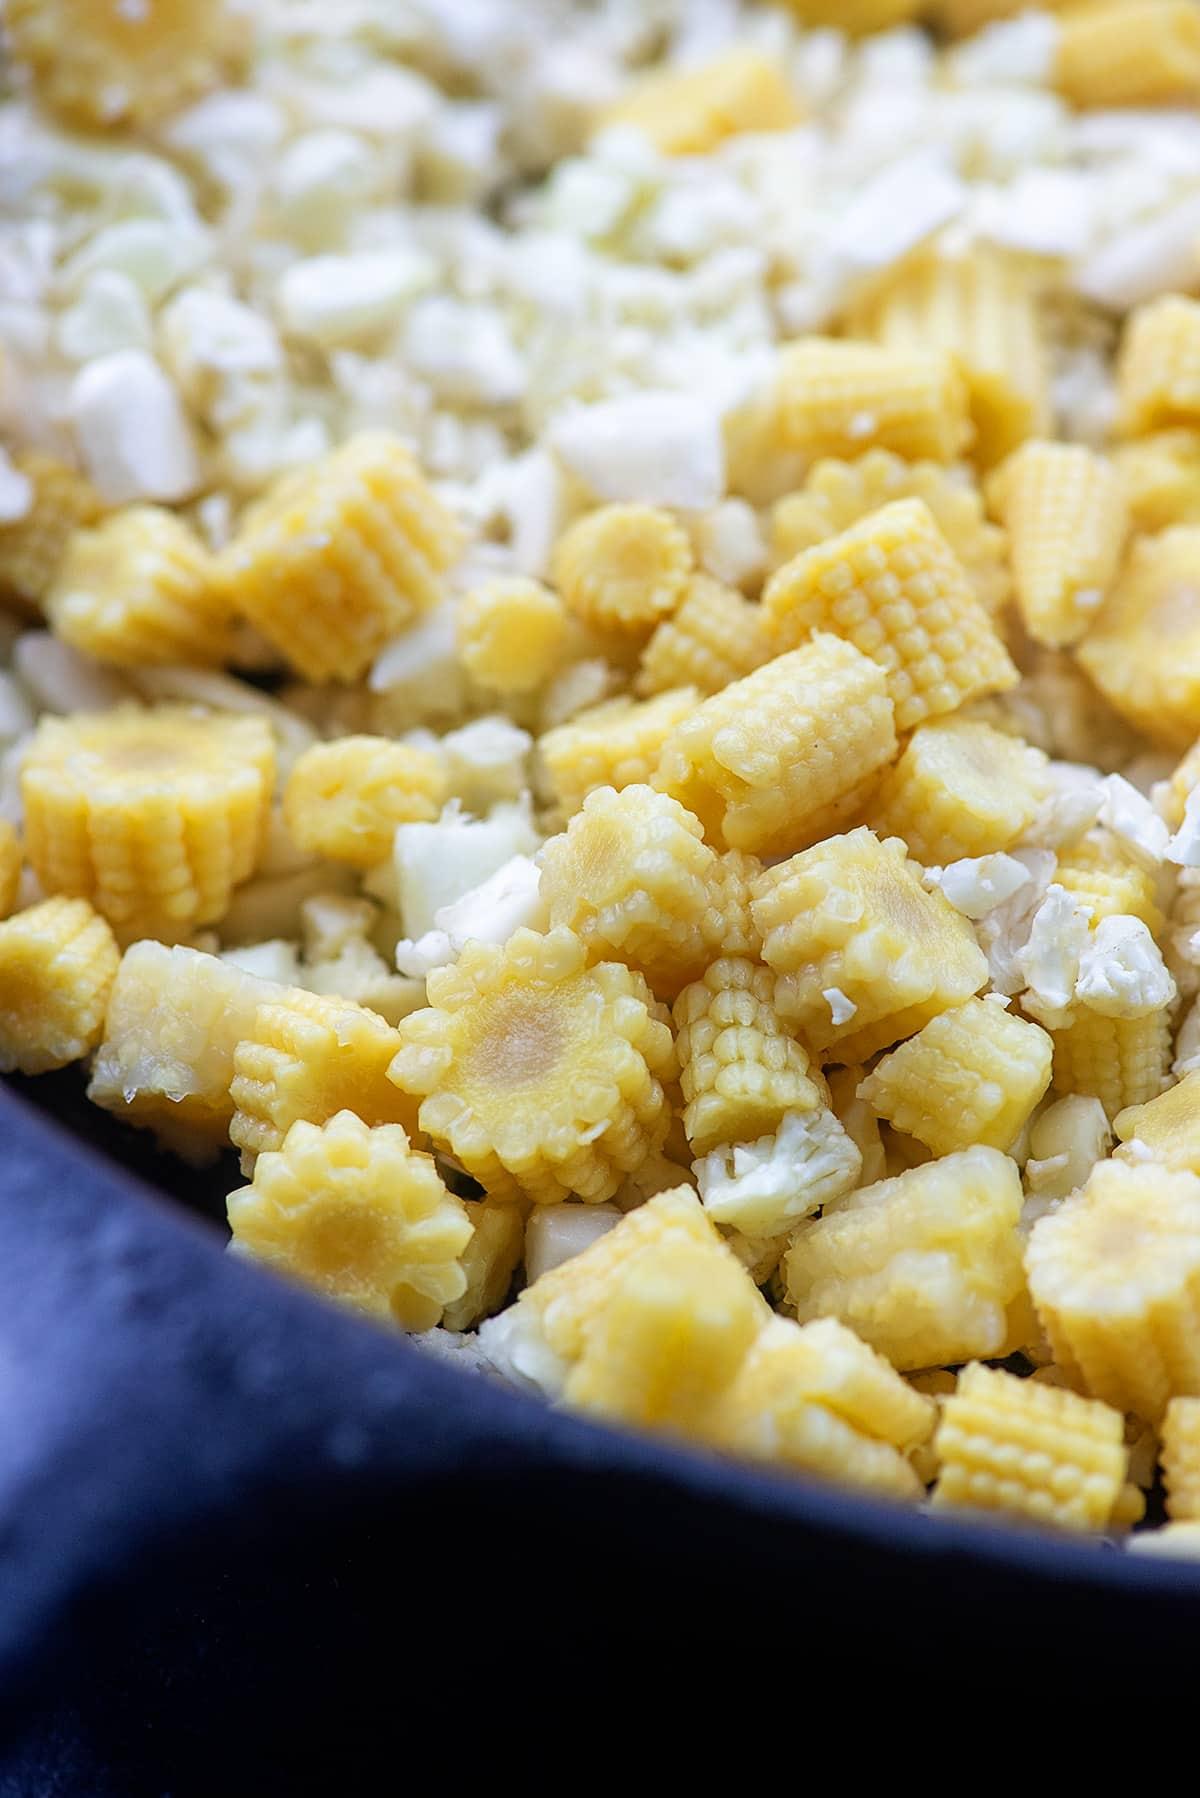 cauliflower and baby corn in cast iron skillet